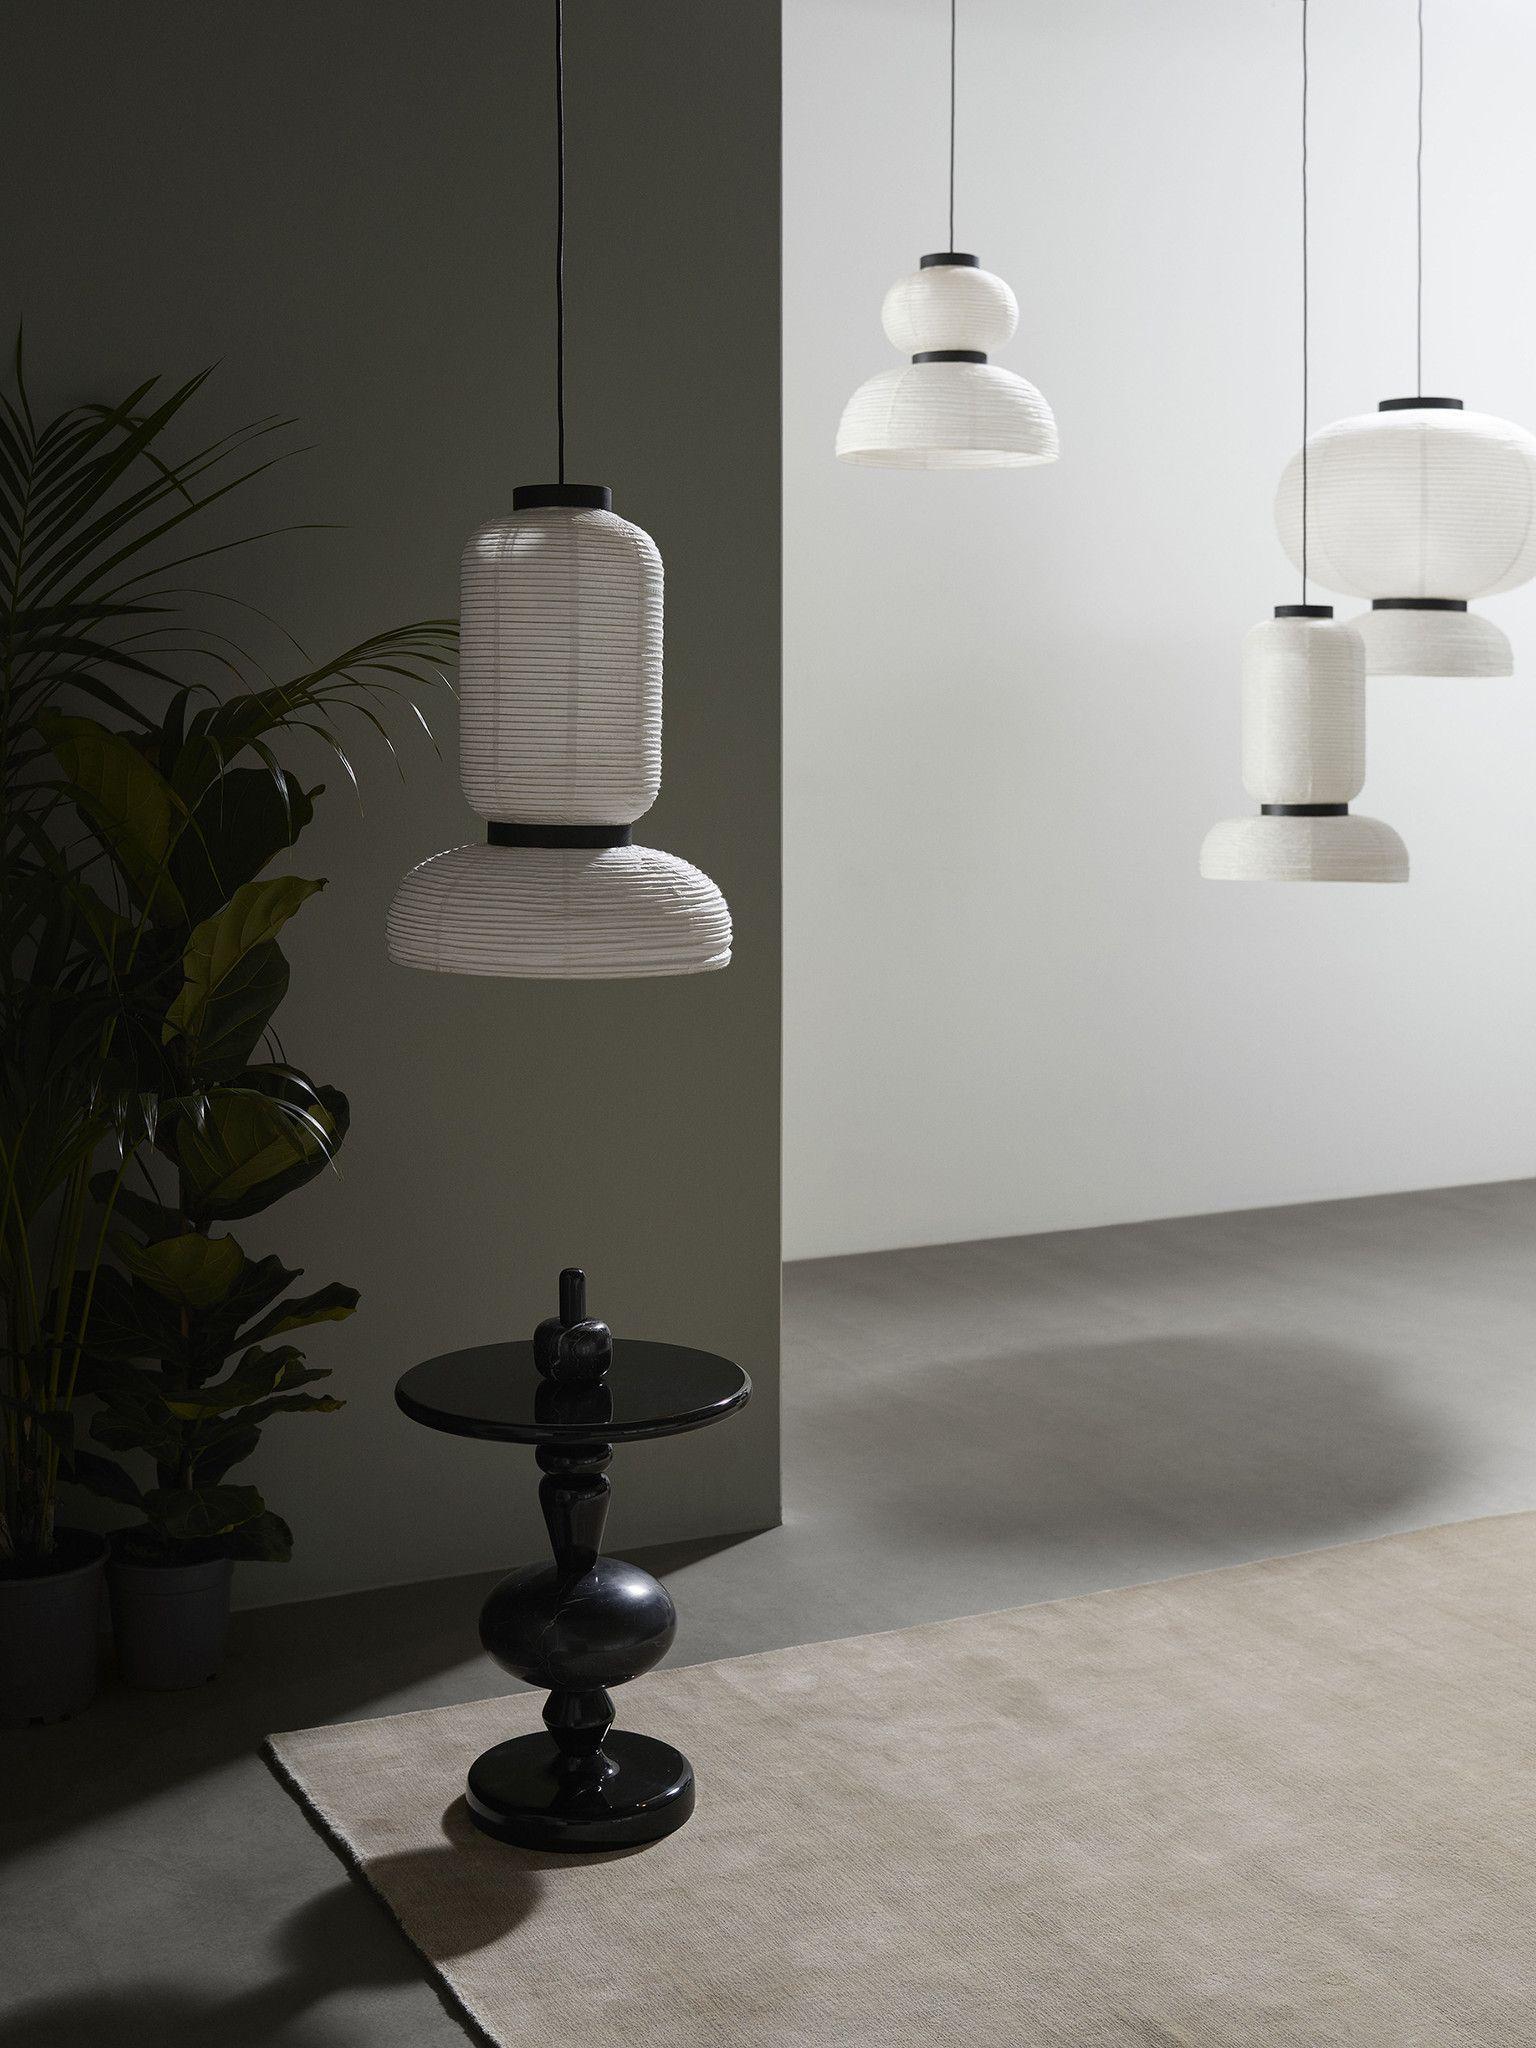 Formakami Jh4 Pendant Traditional Interior Design Lamp Pendant Lamp